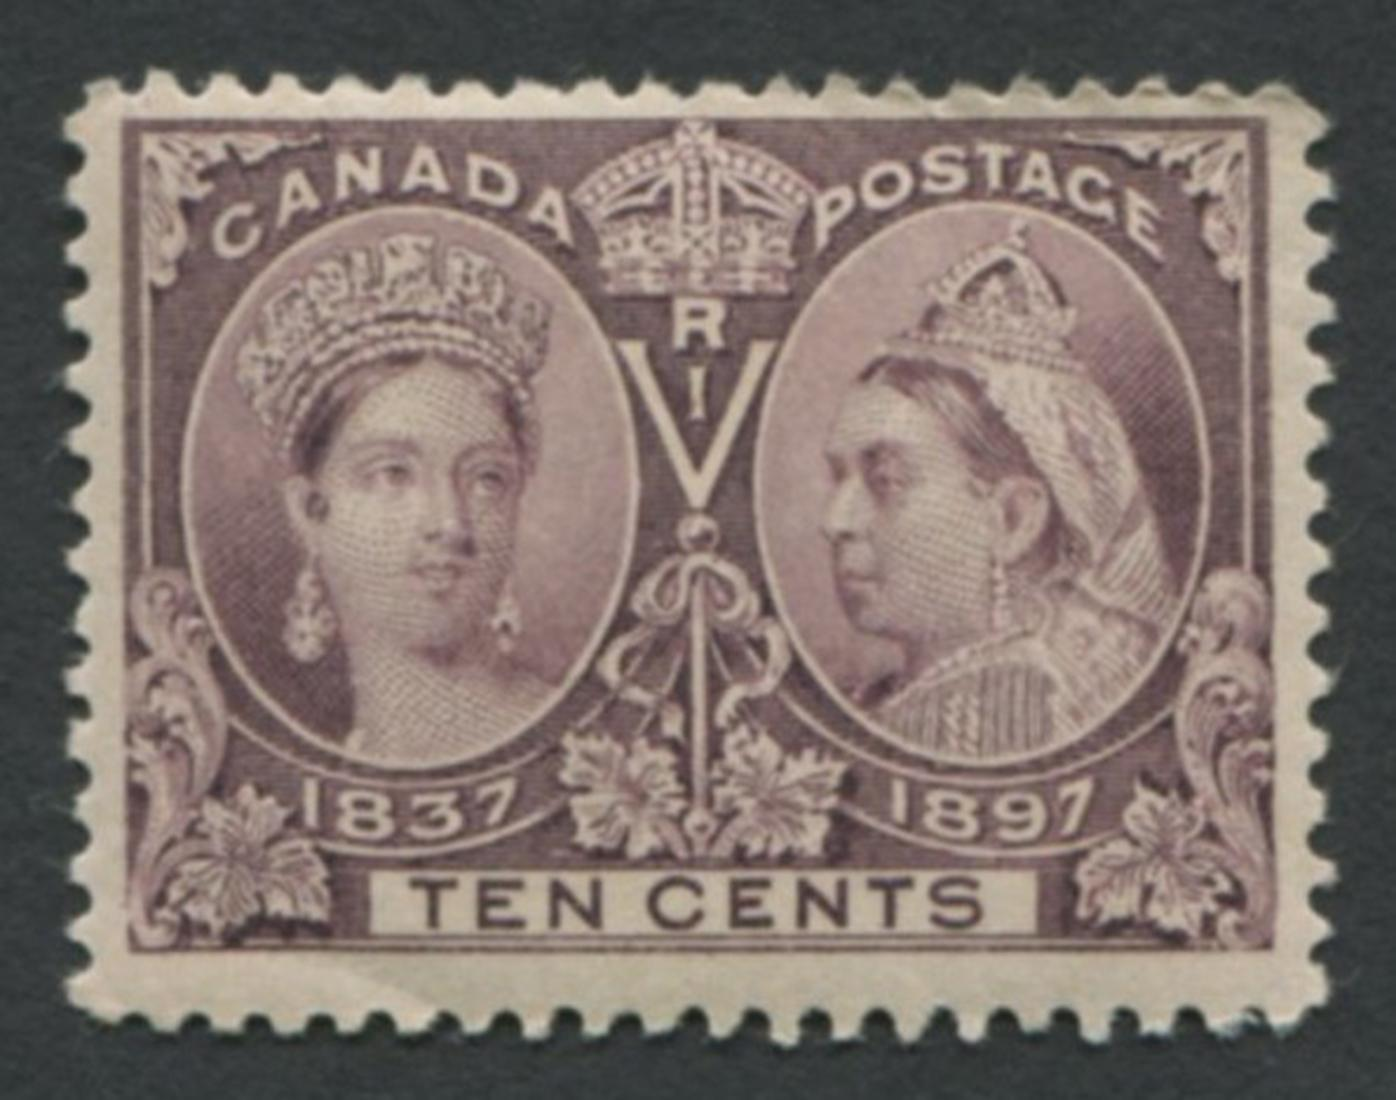 Canada 1897 #57 10c Jubilee MNH F/VF OG